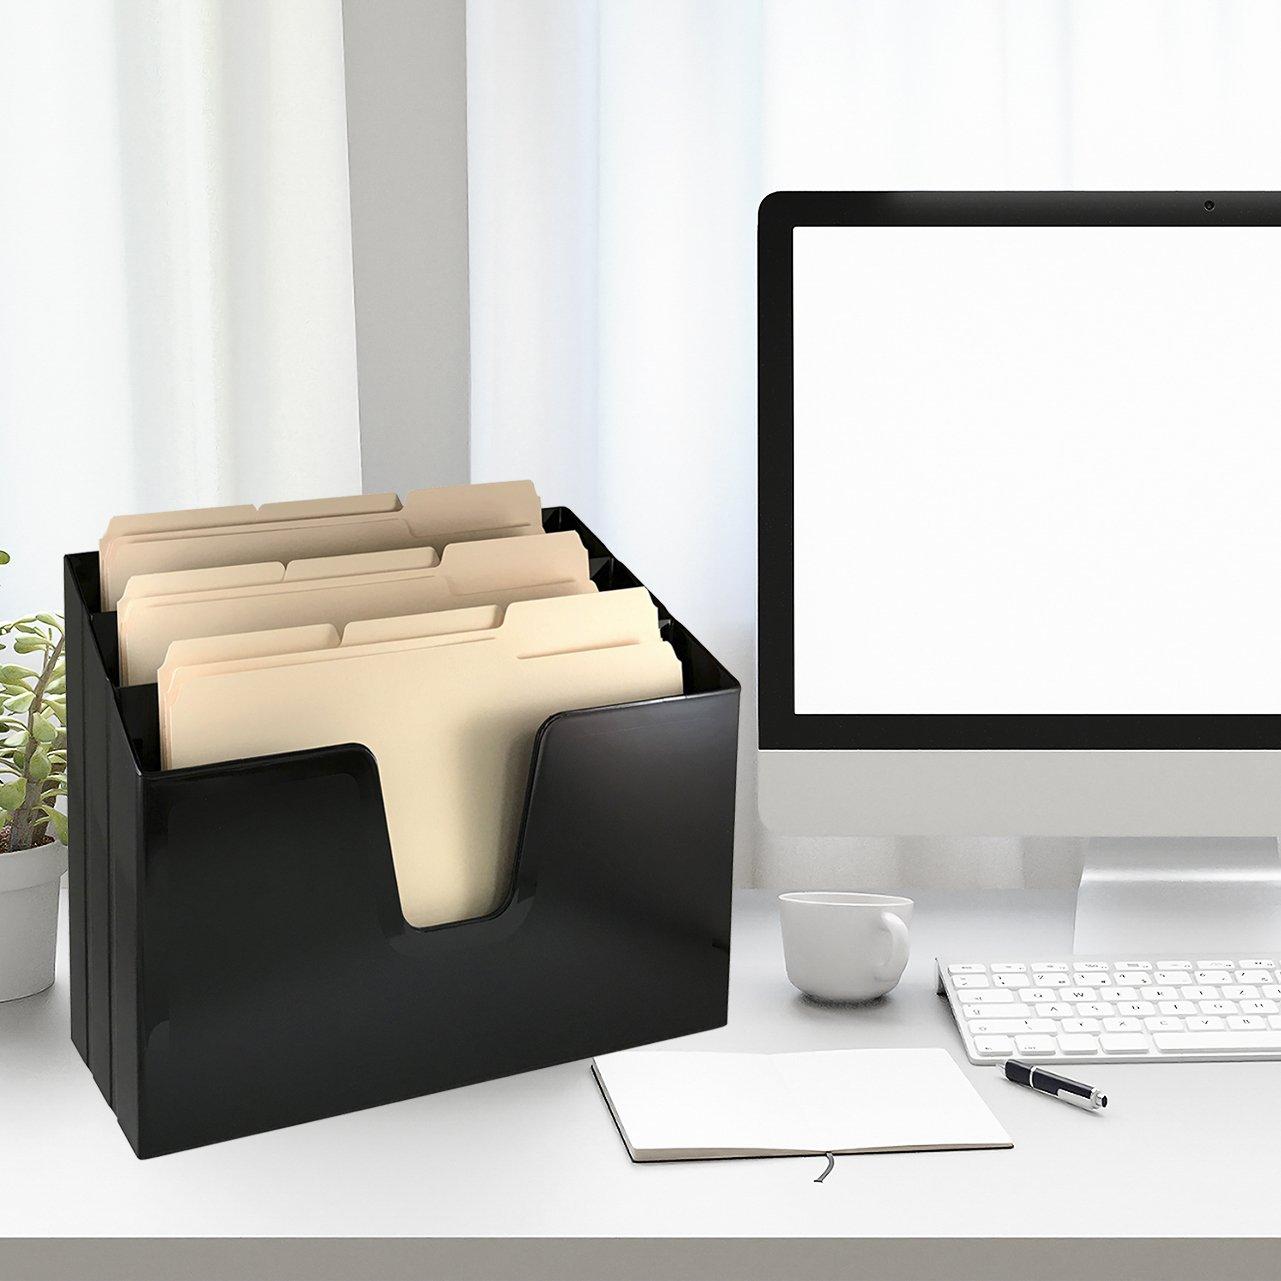 Acrimet Horizontal Triple File Folder Organizer (Folders Included) (Black Color)